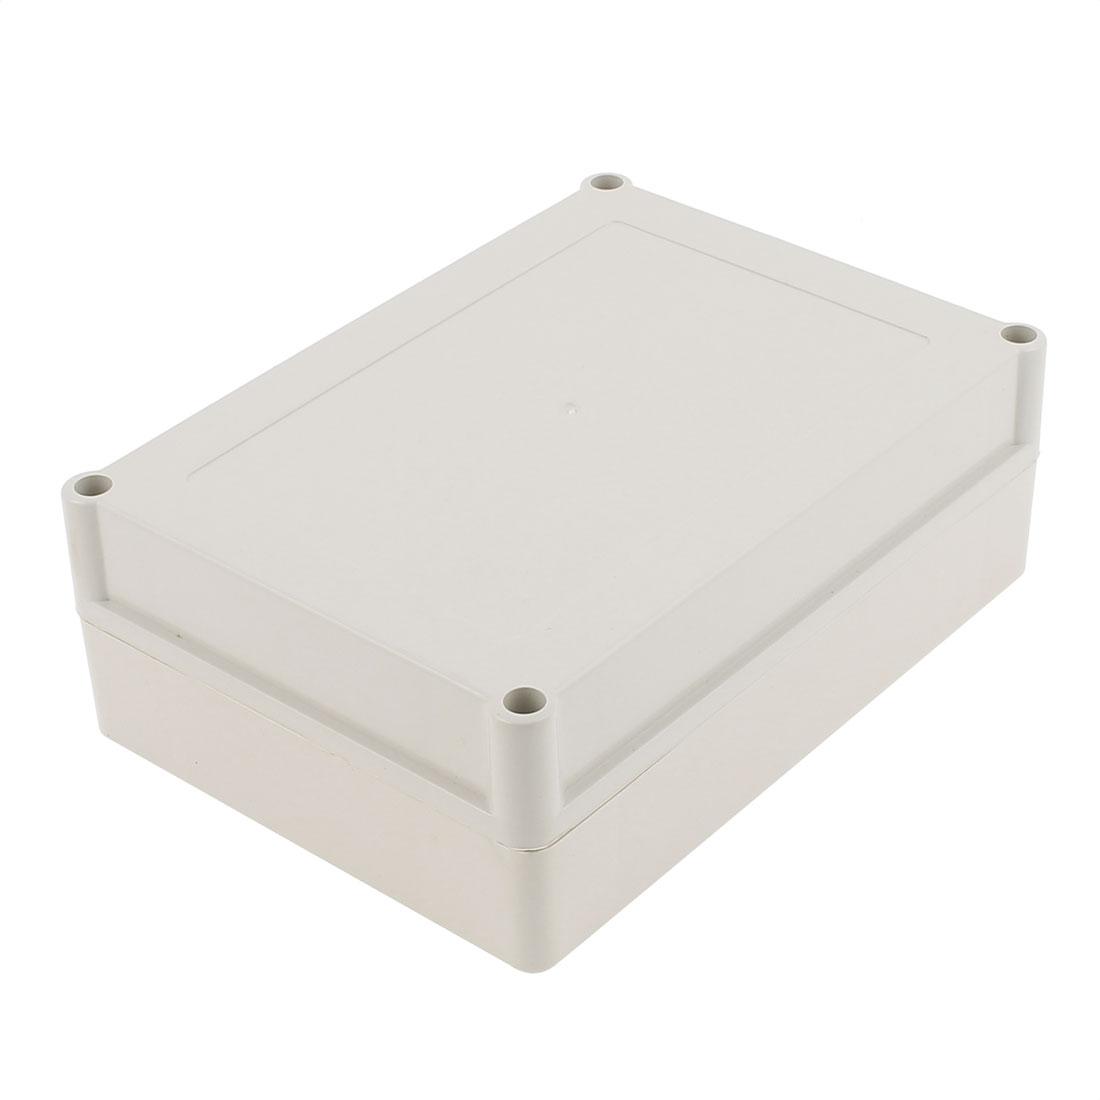 180 x 130 x 63mm Dustproof IP65 Junction Box DIY Terminal Connecting Enclosure